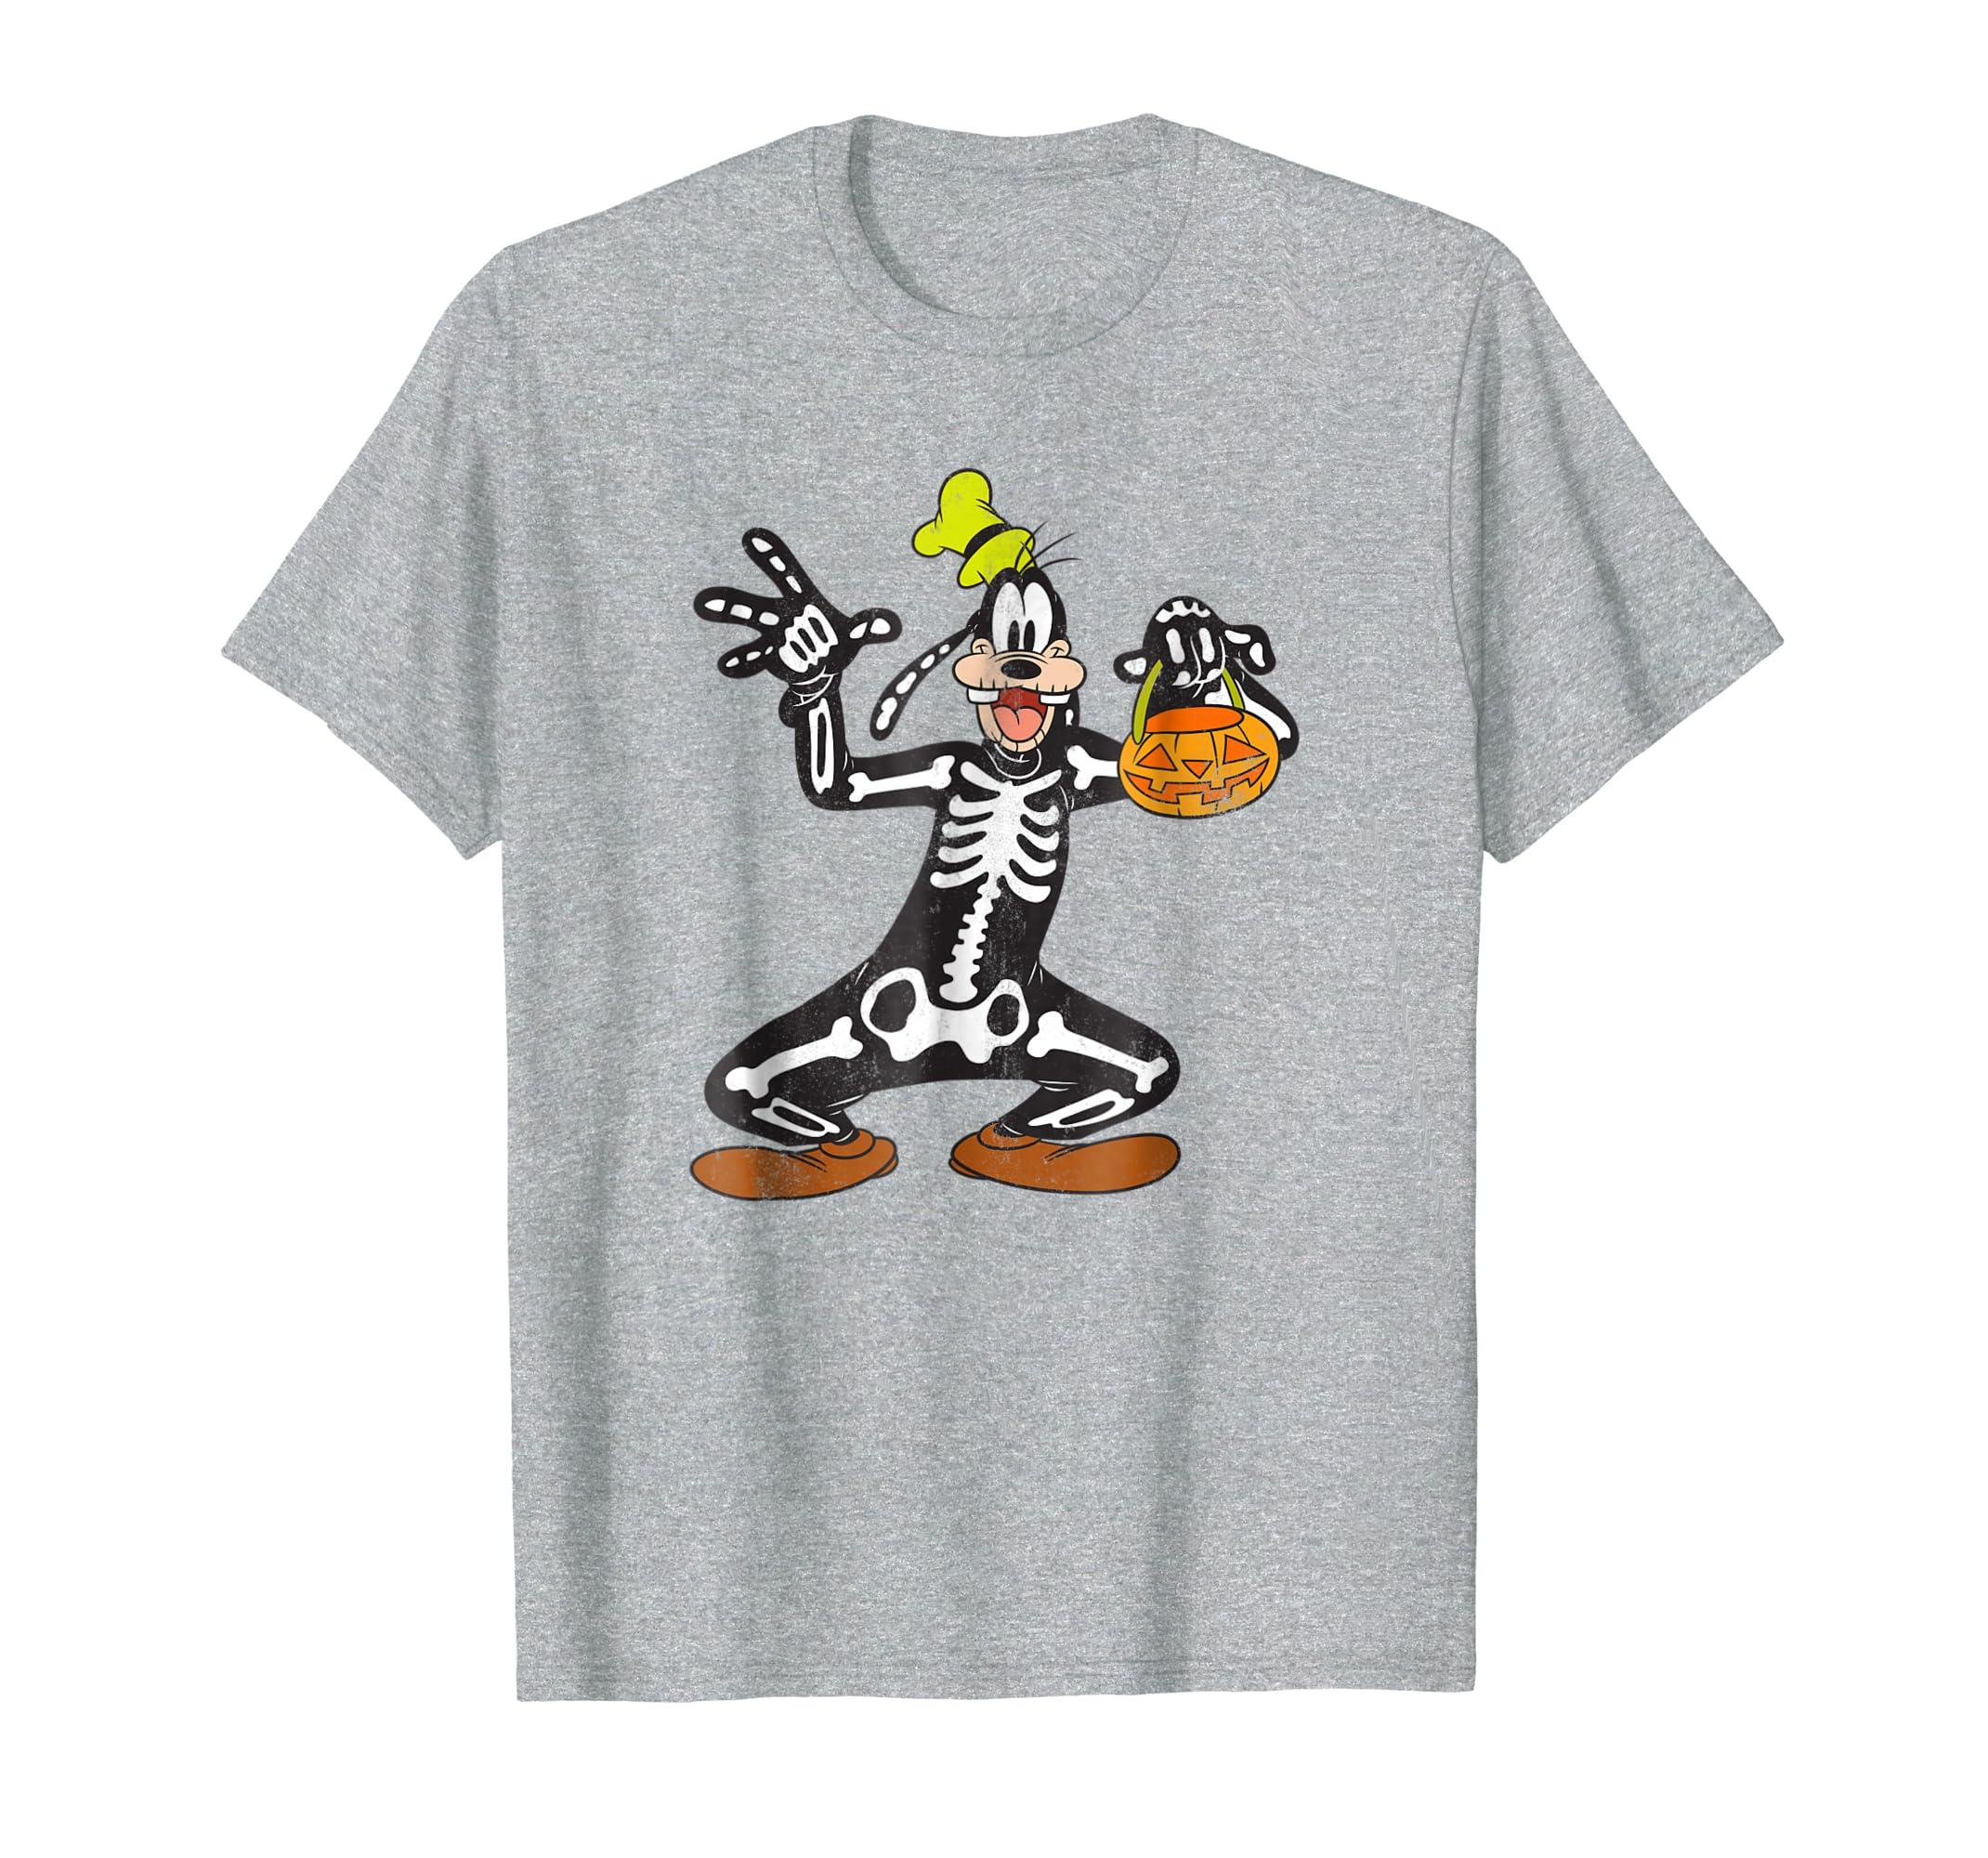 6b71285f55ba2 Amazon.com  Disney Goofy Skeleton Halloween T Shirt  Clothing